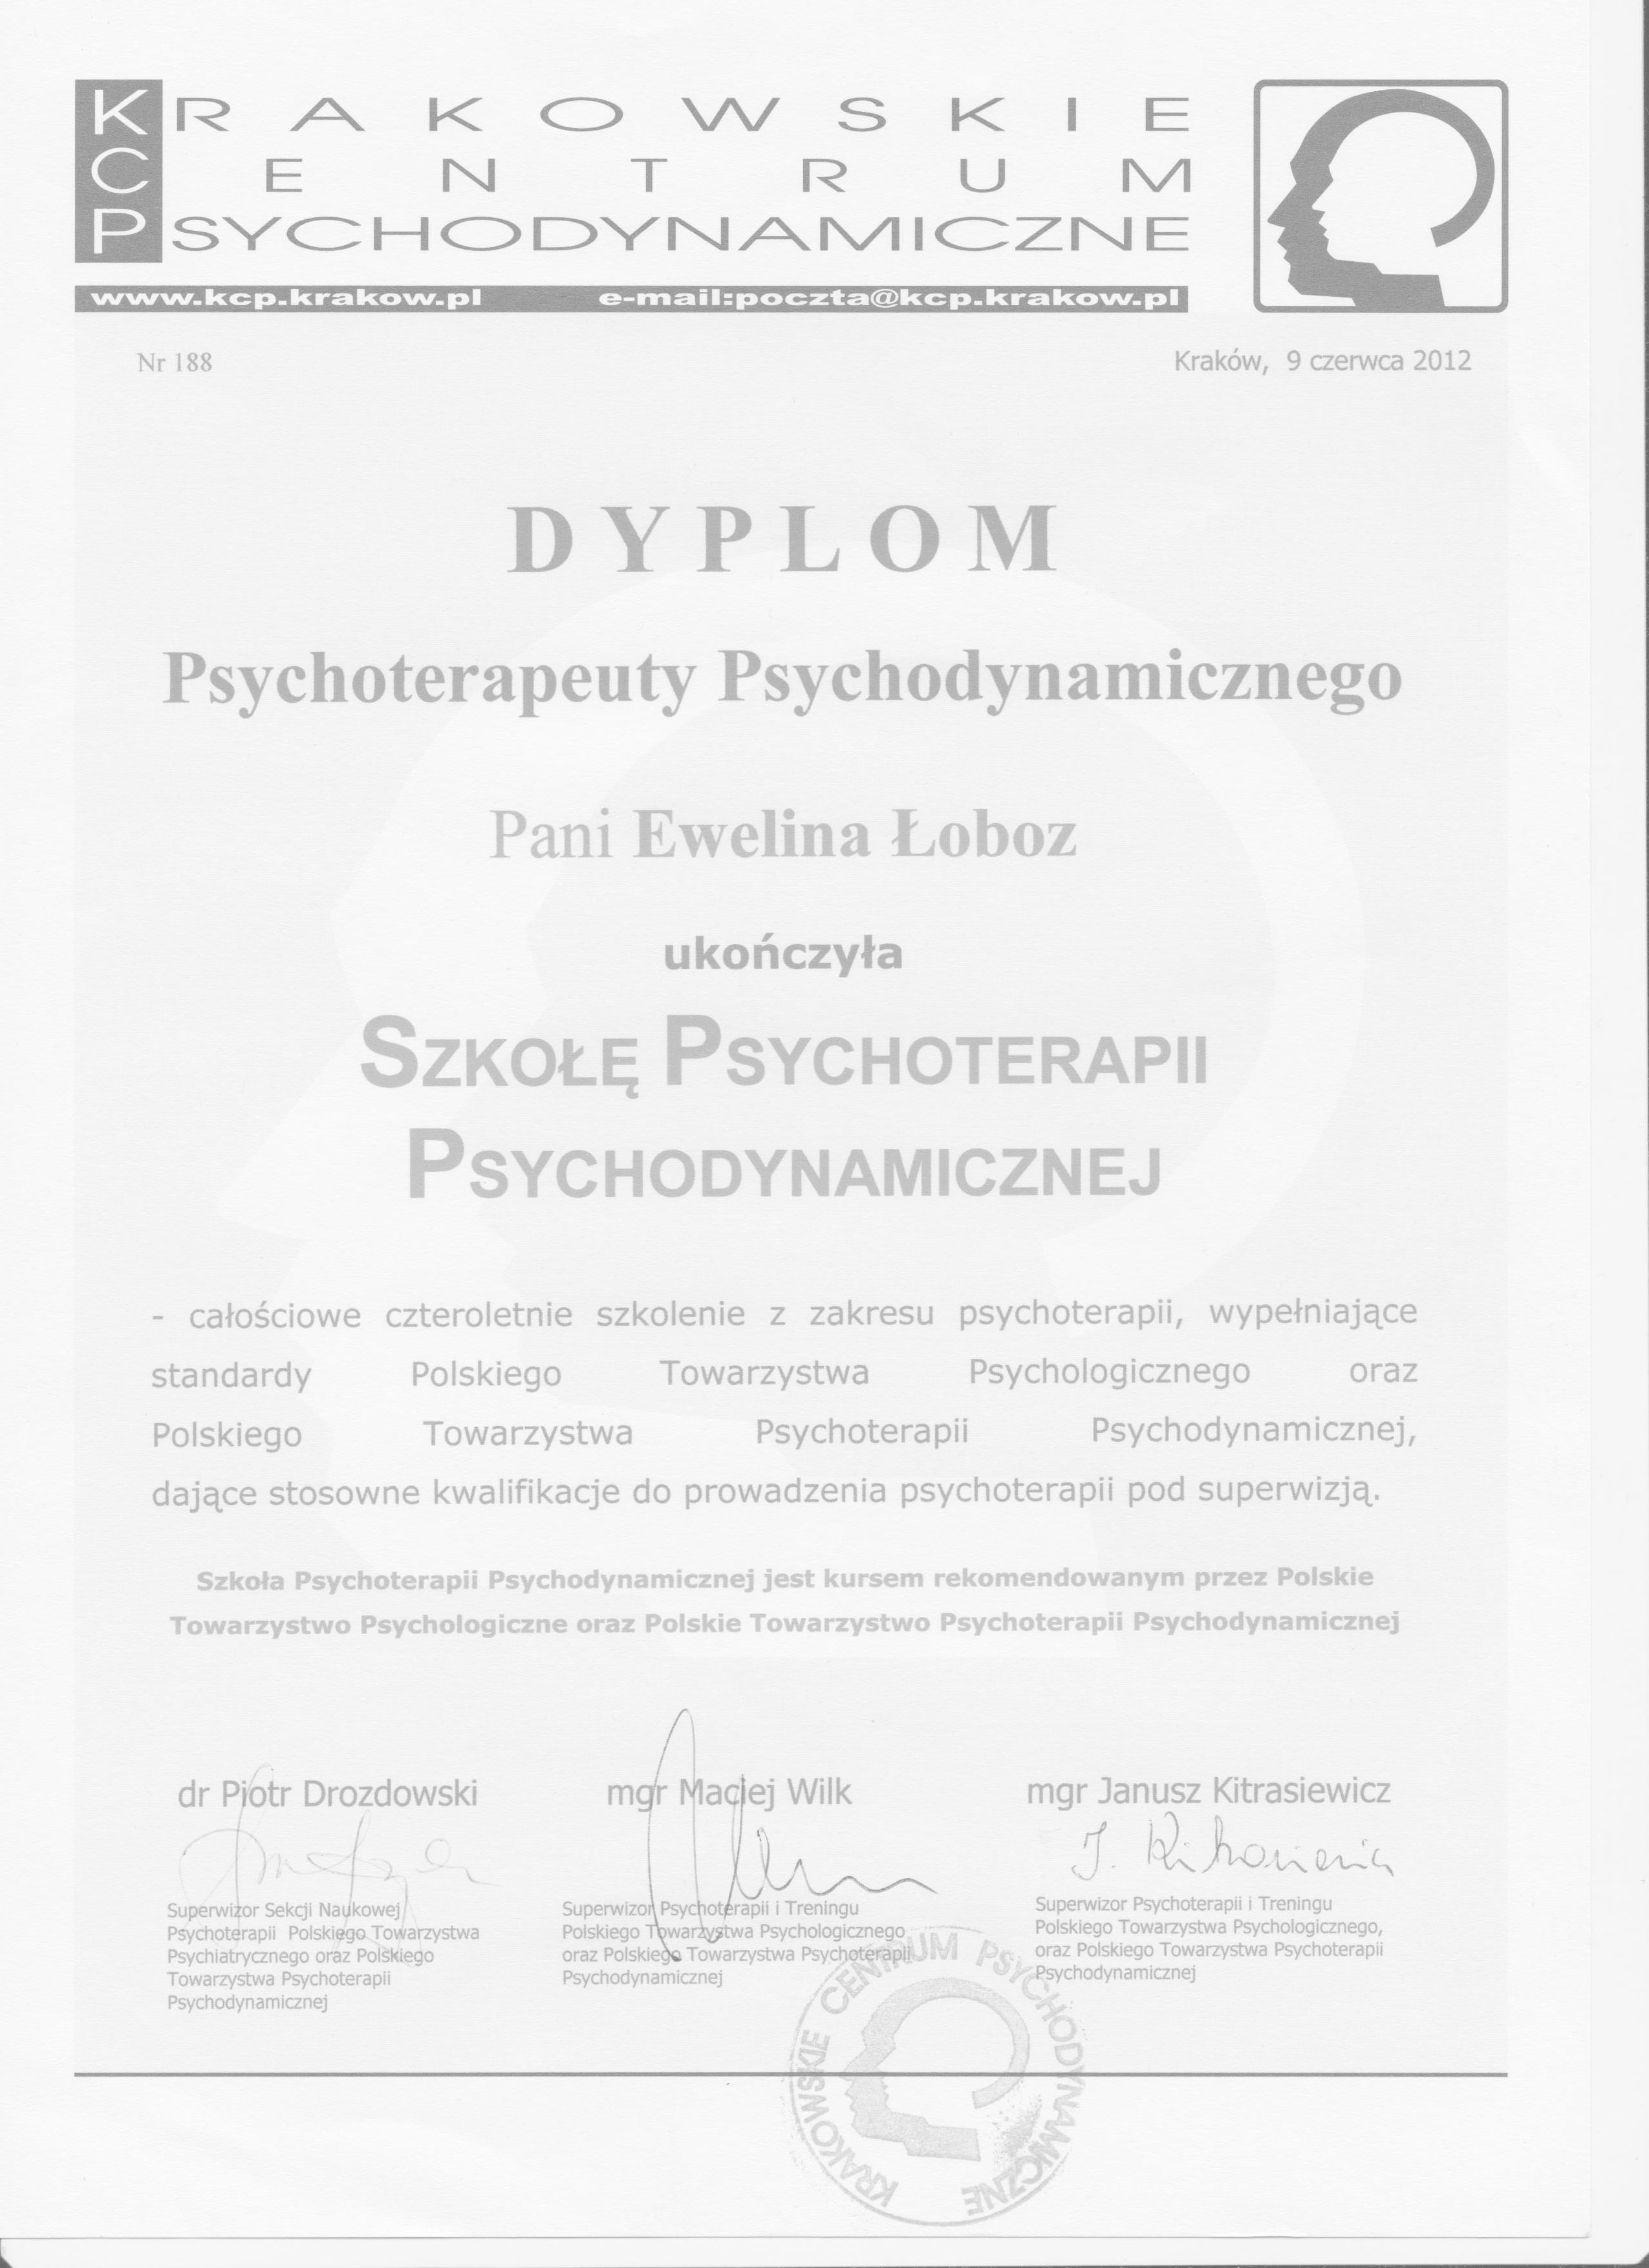 Ewelina Łoboz Psychoterapia skan dyplomu KCP